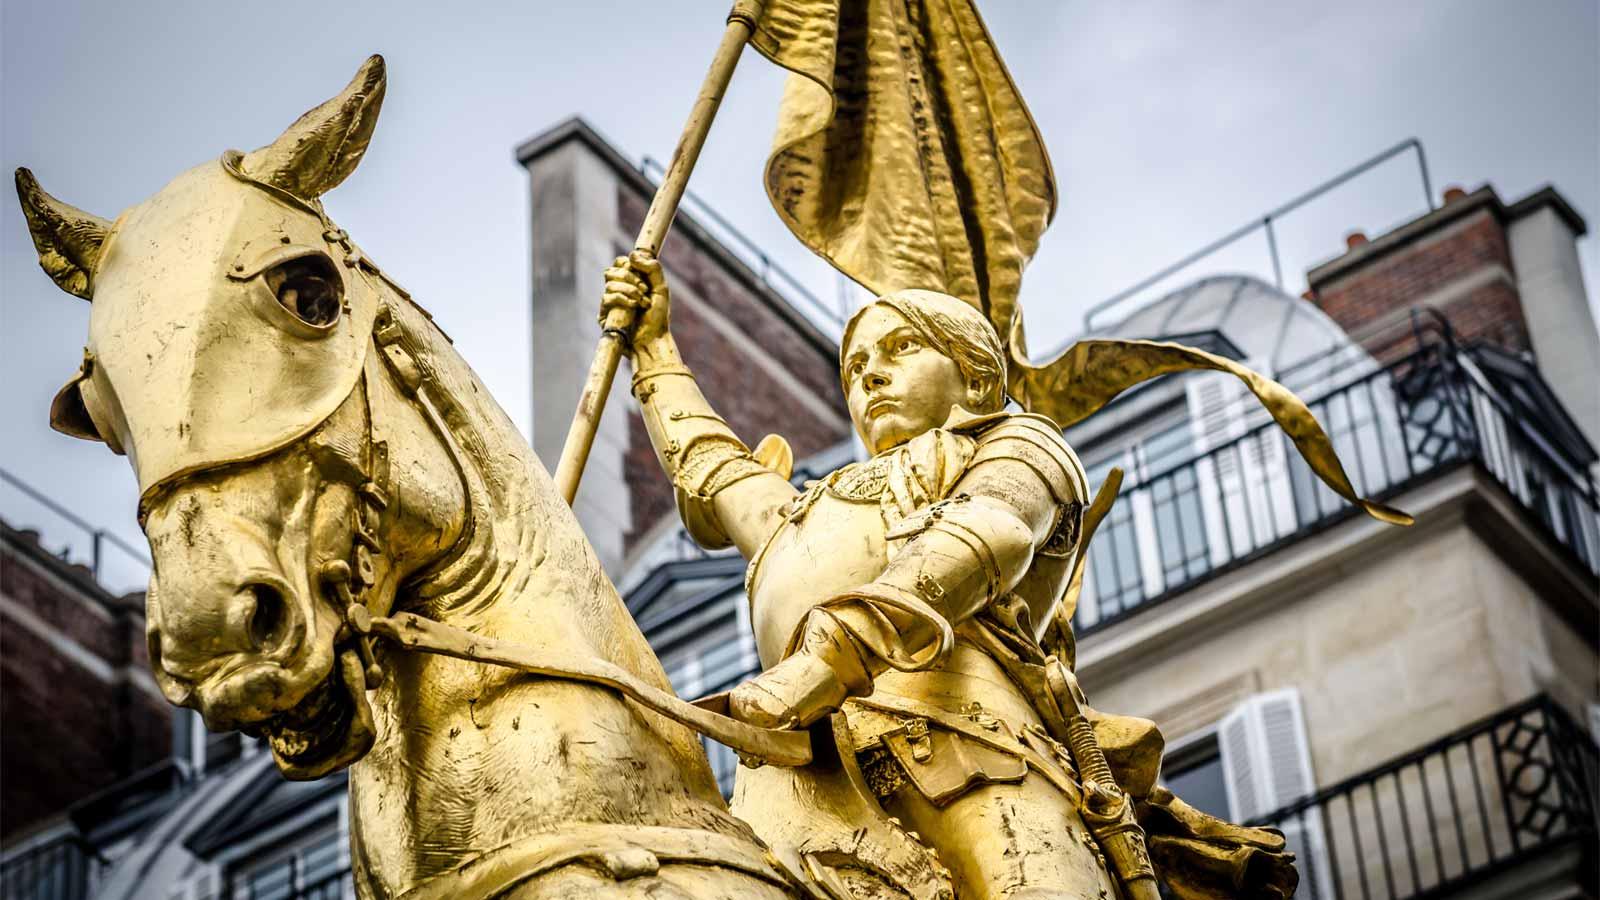 Joan of Arc | source: BlackMac/Shutterstock.com